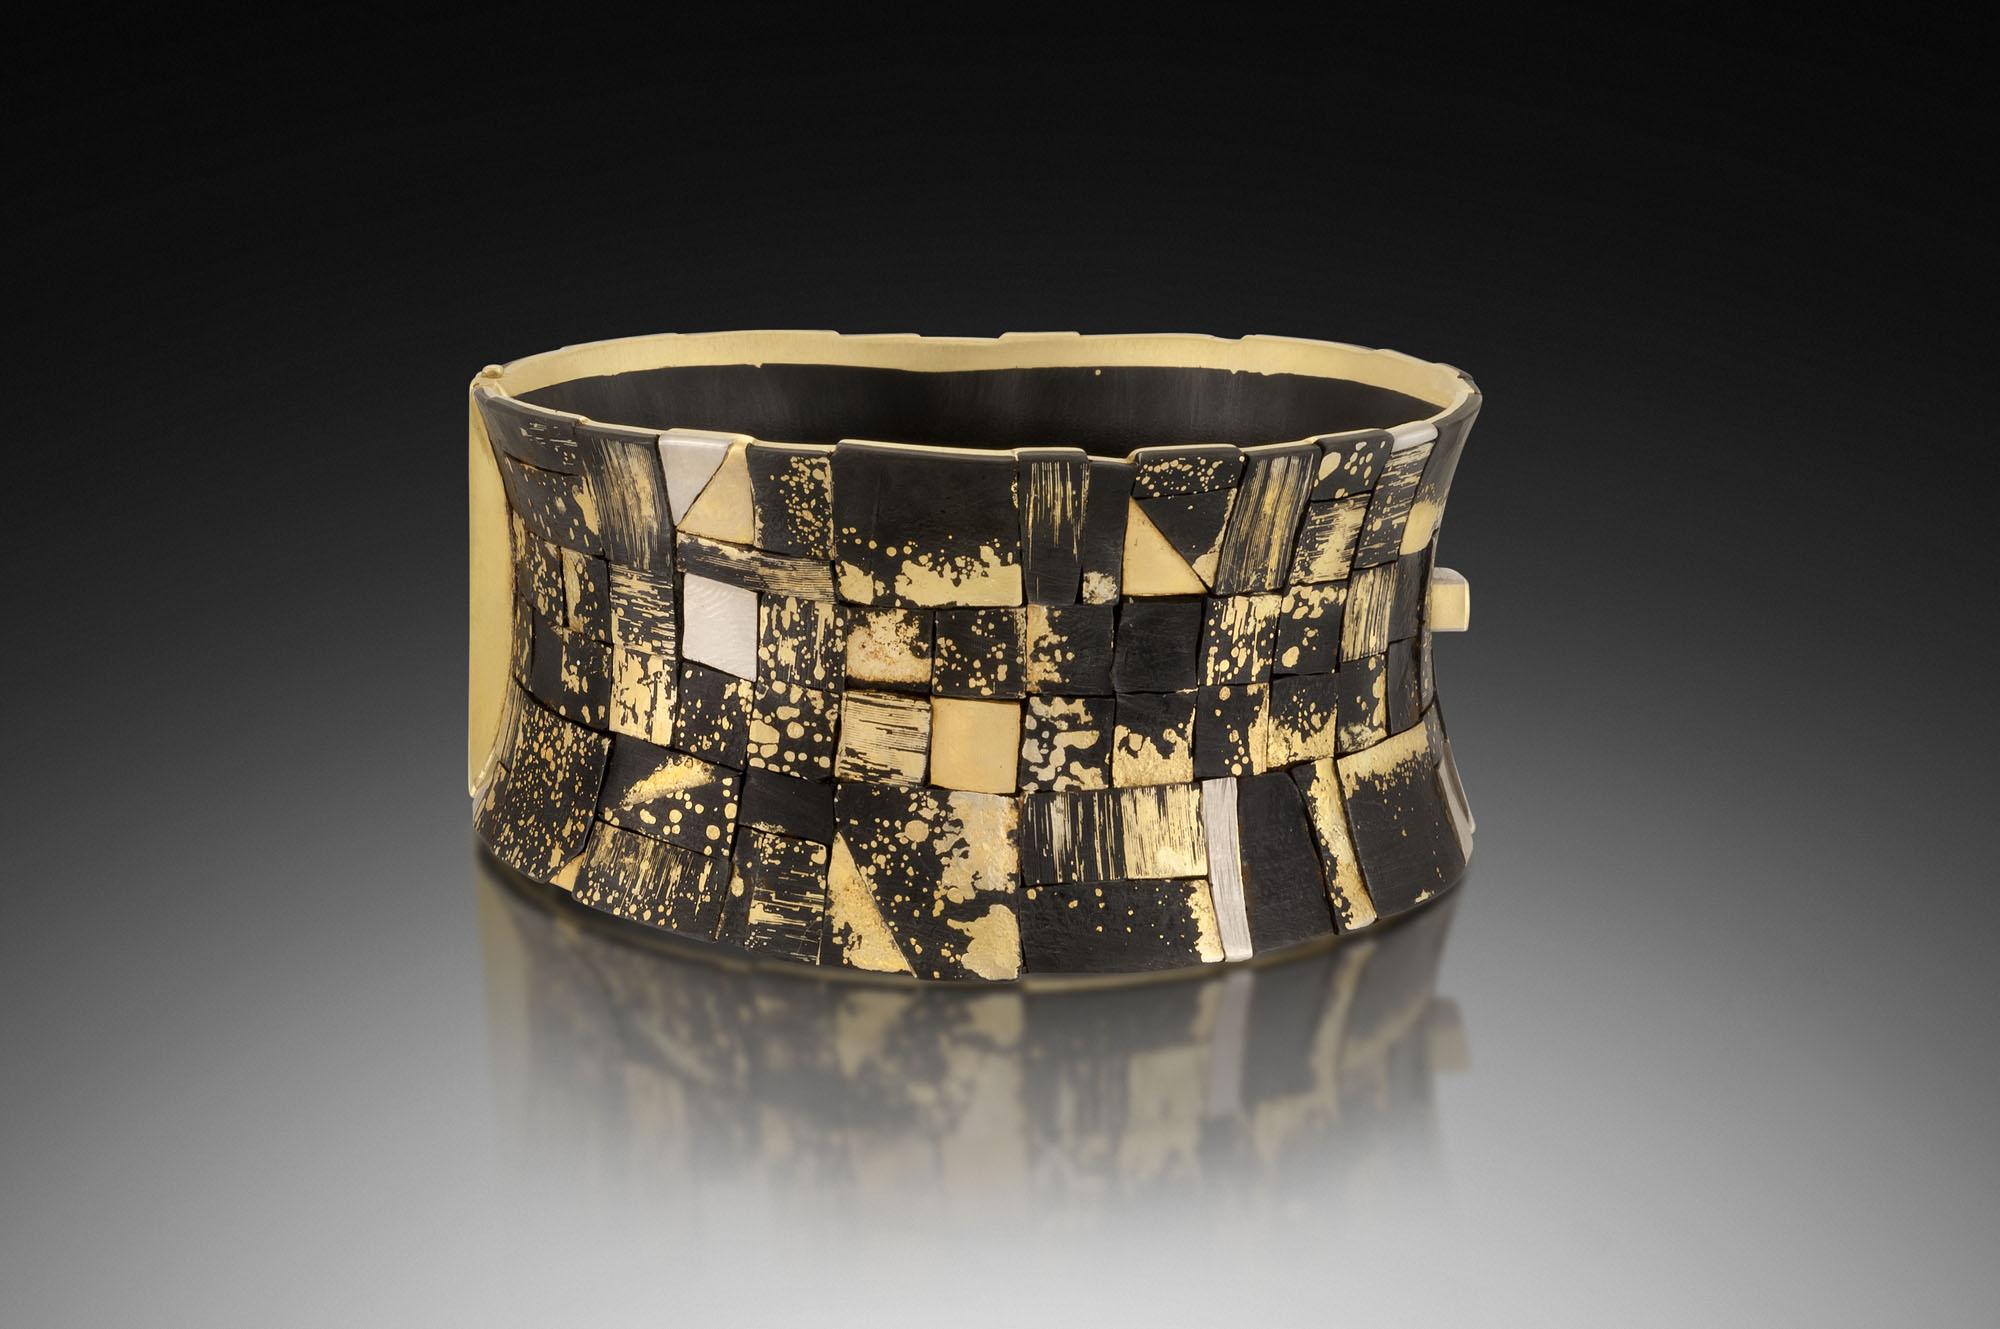 Dished Mosaic Locking Bracelet